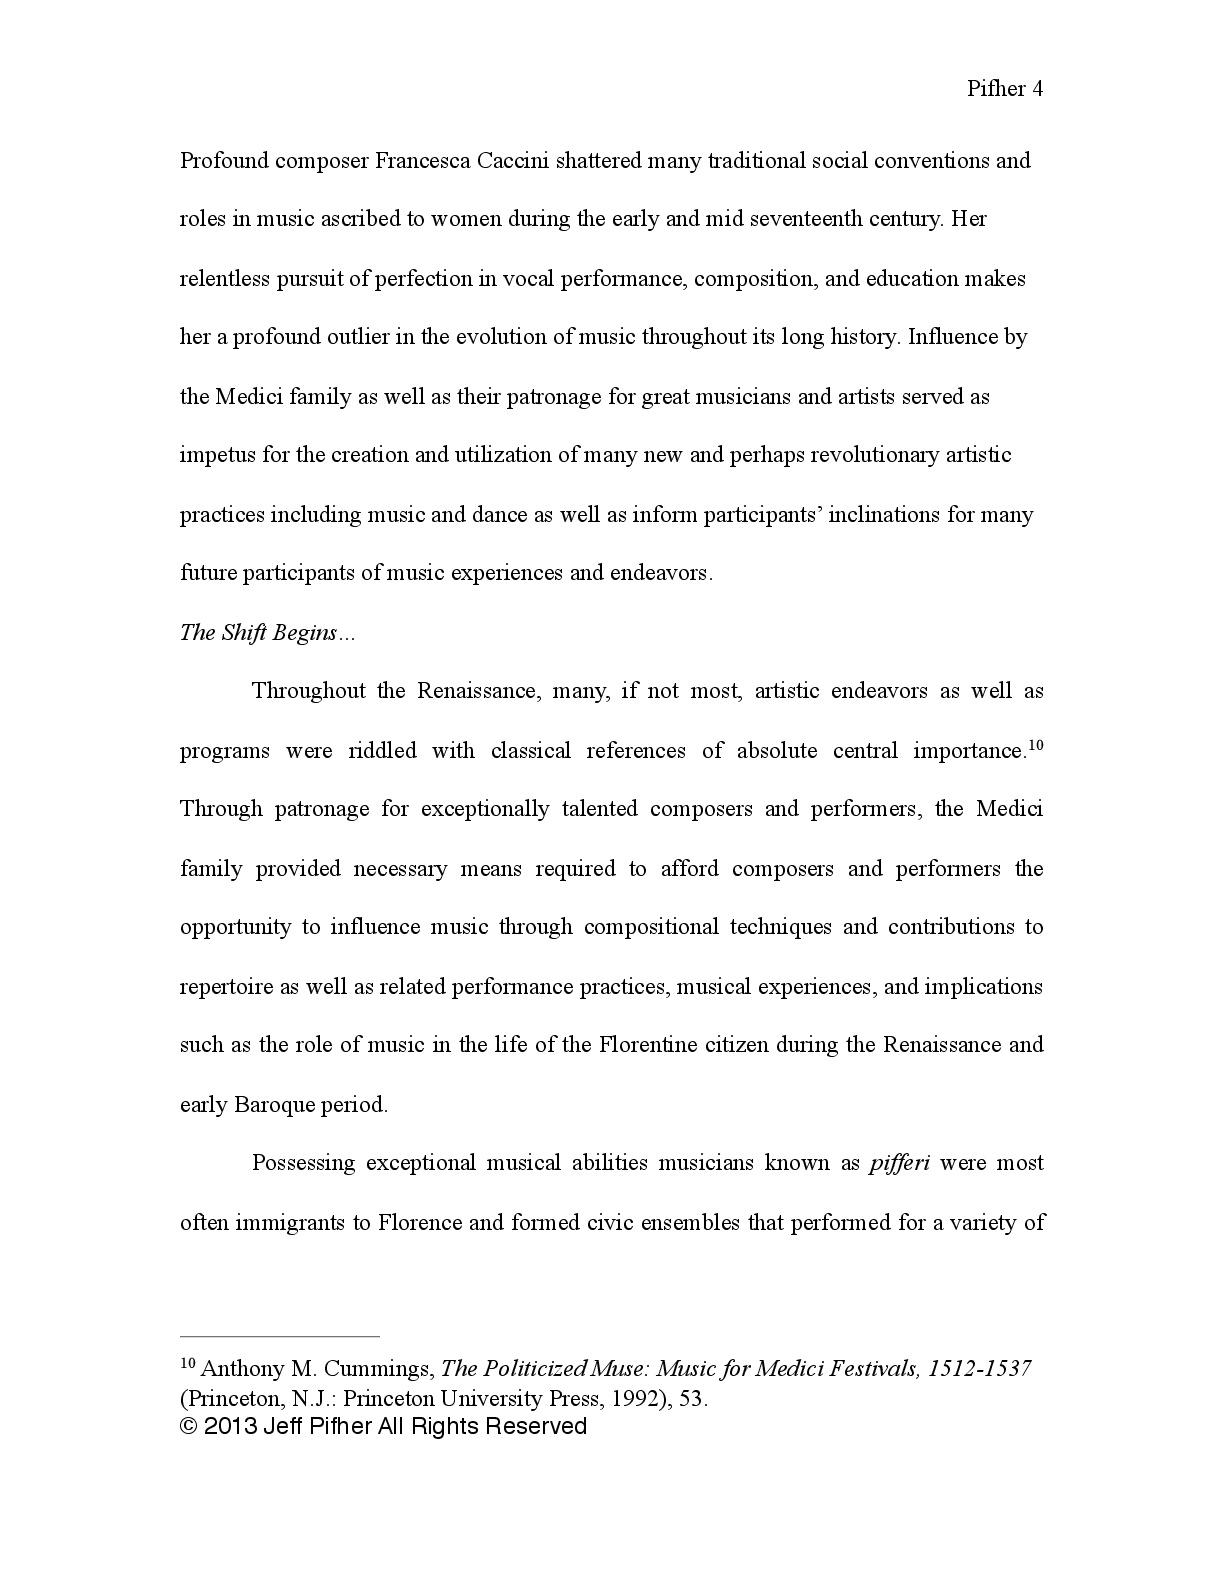 Jeff-Pifher-Music-and-Mediciean-Influences-(Academic-Series)-004.jpg